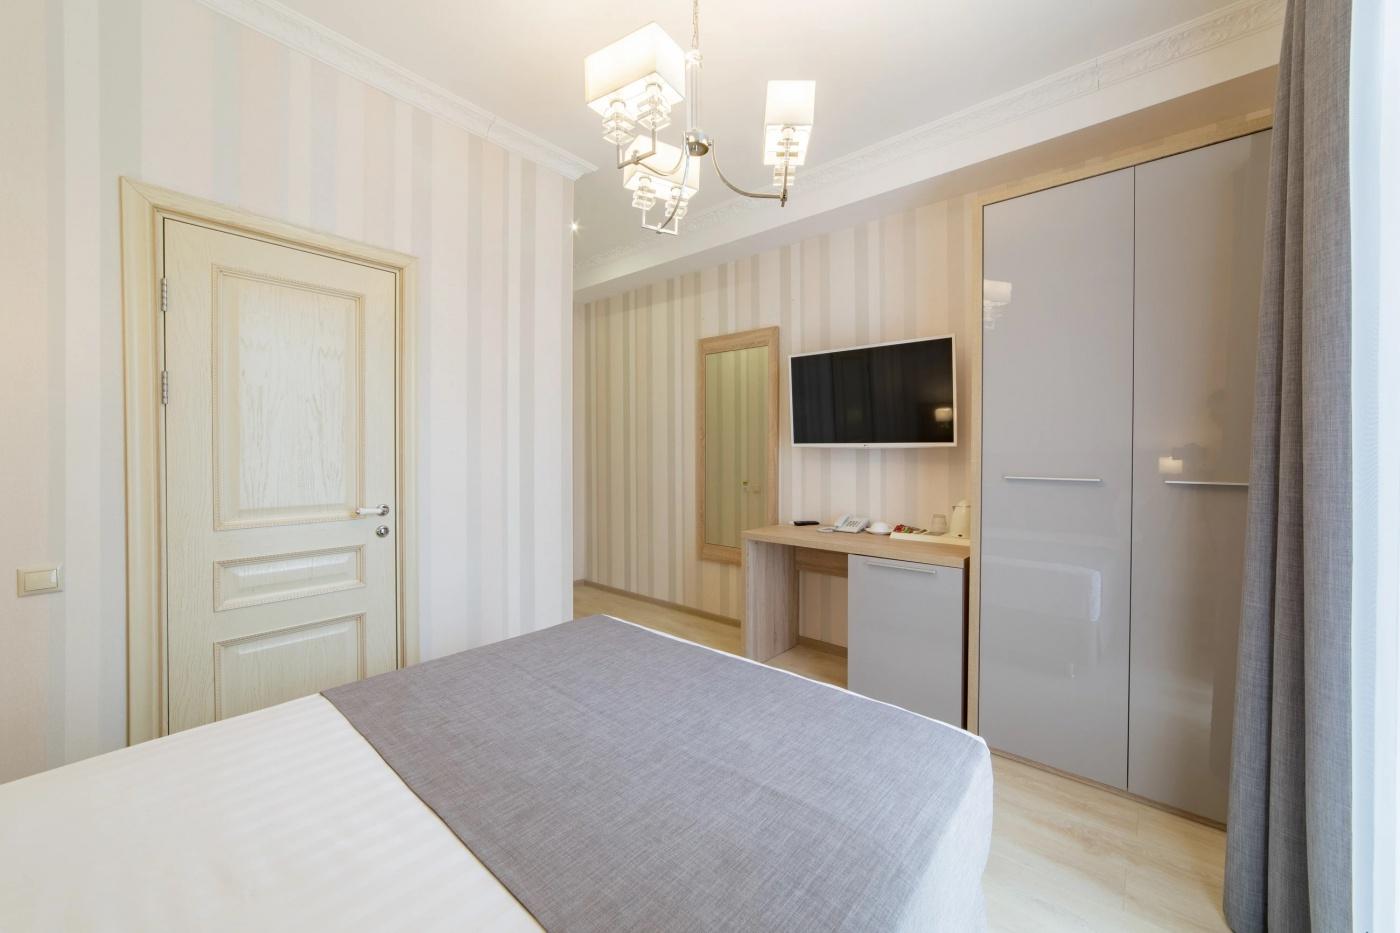 Отель «Alean Family Hotel Usadba 4*» Краснодарский край Стандарт 1-местный, фото 2